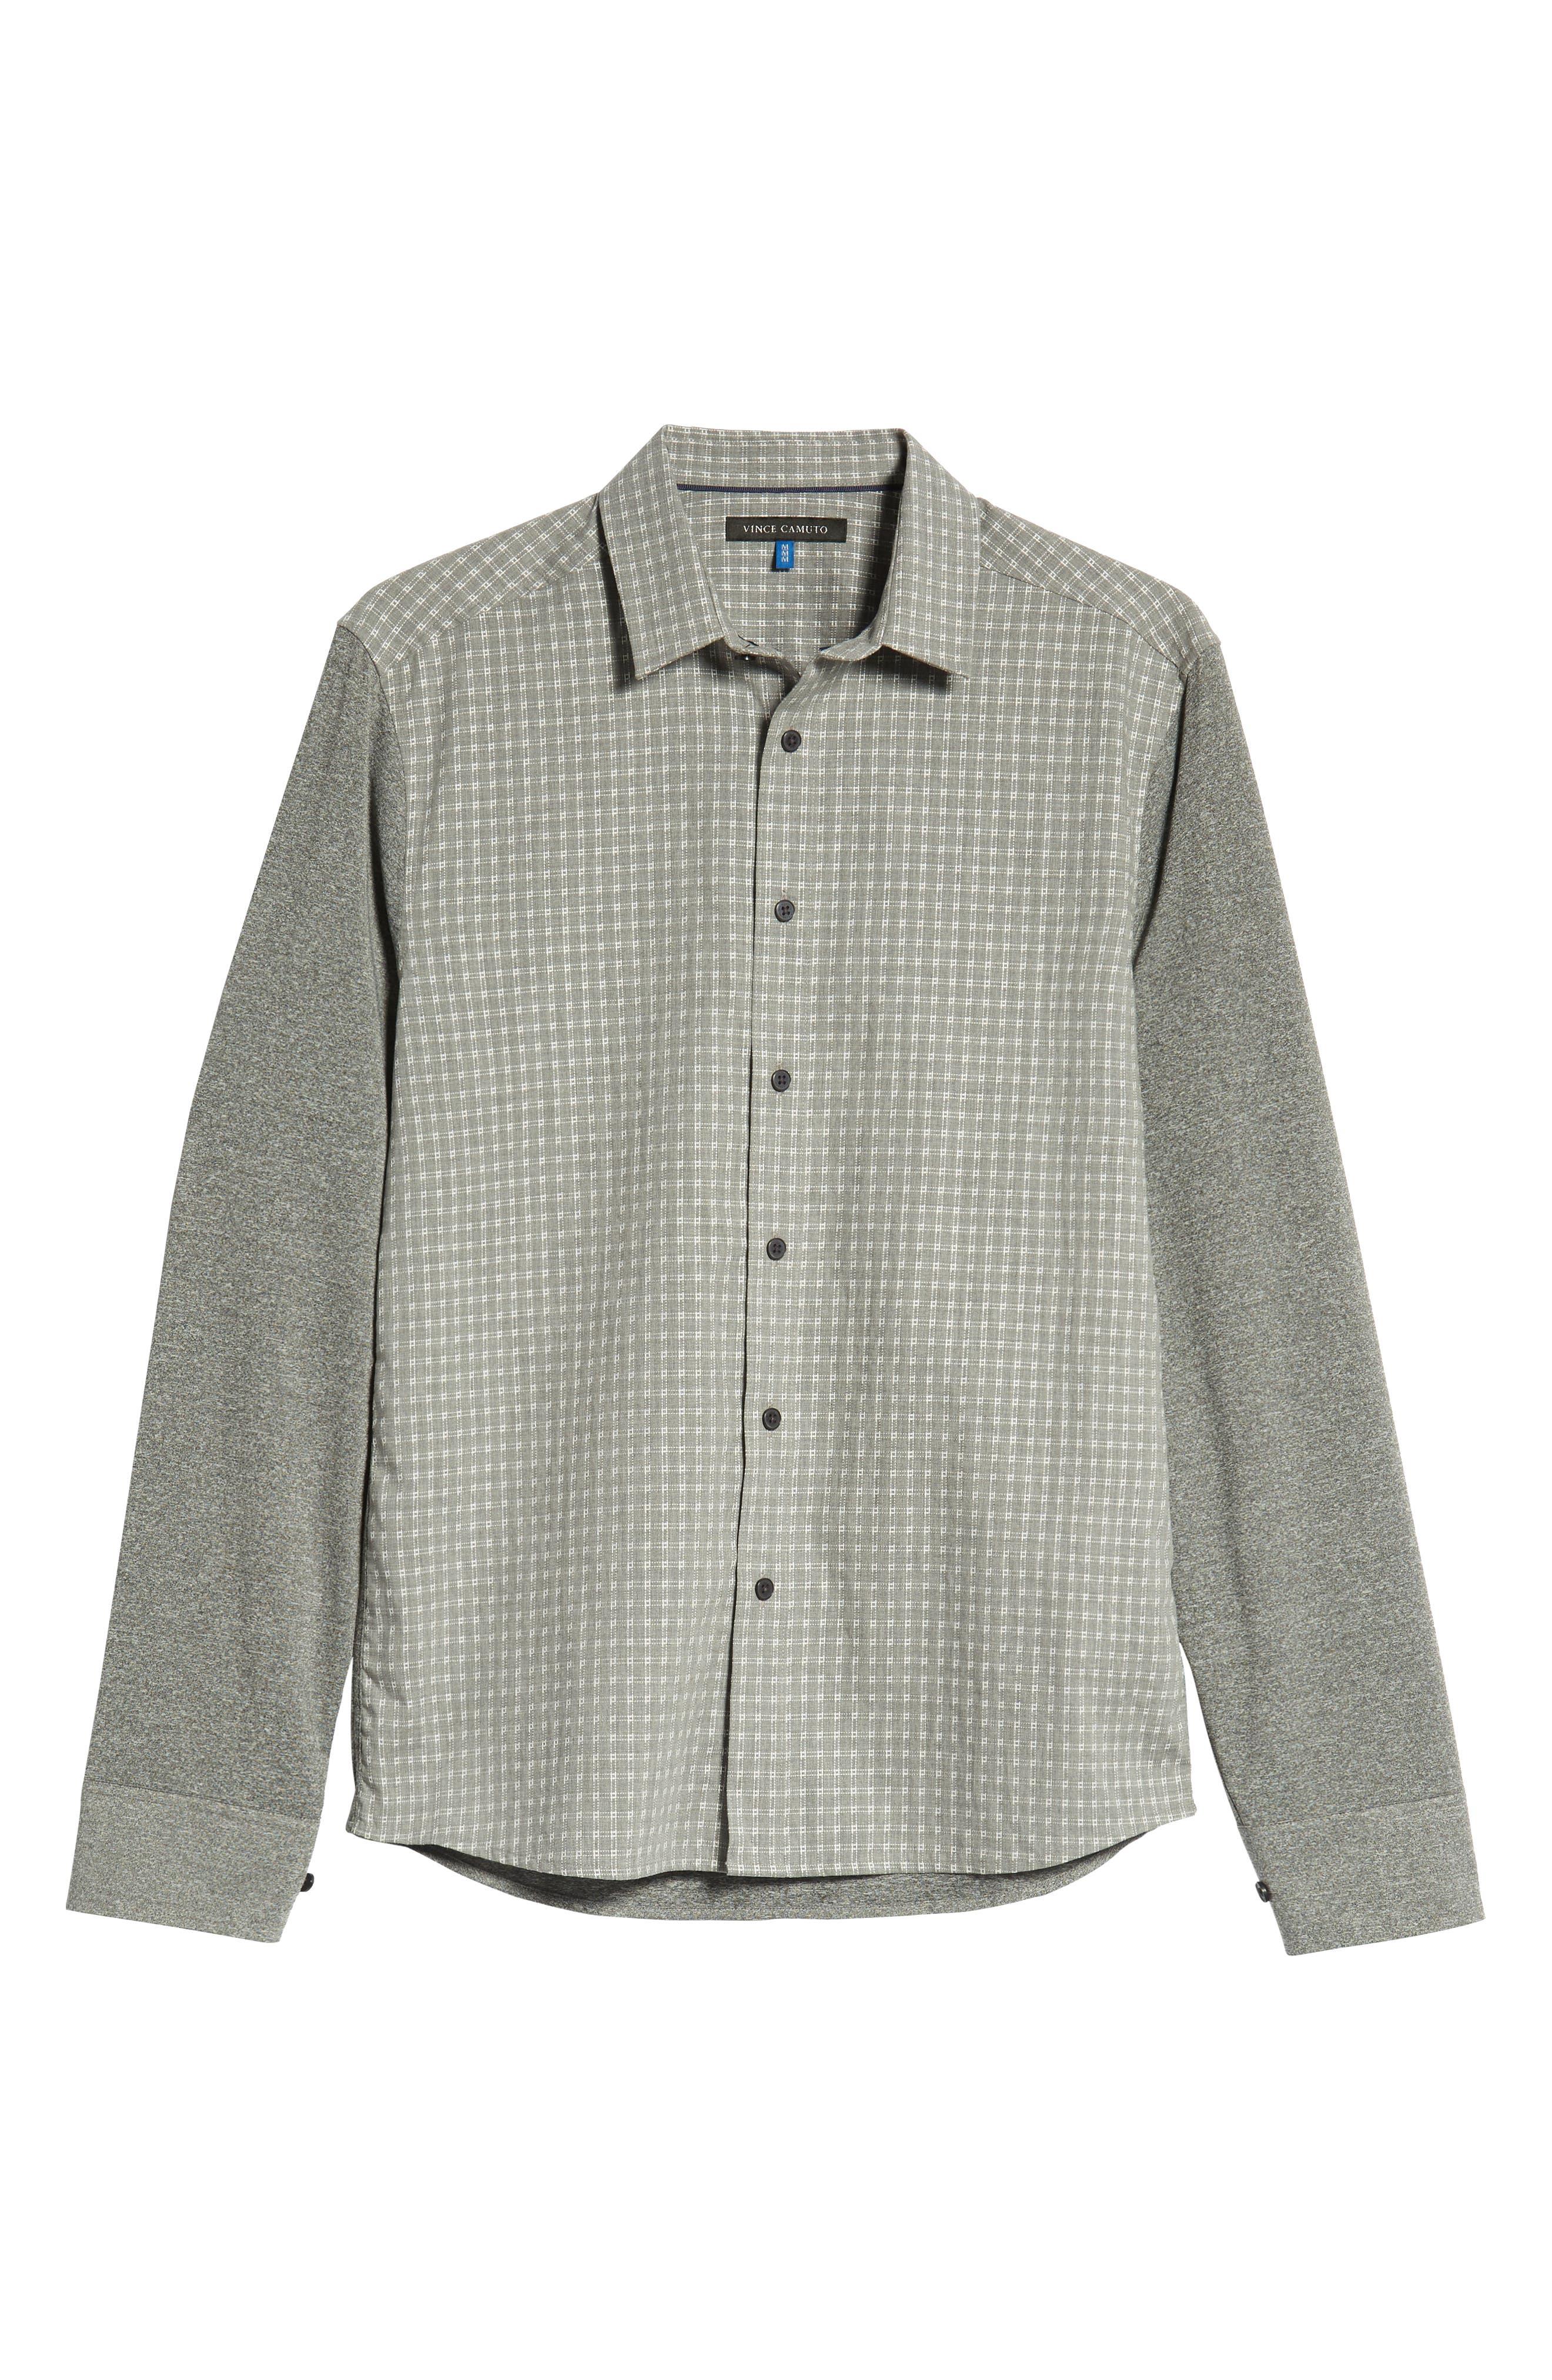 VINCE CAMUTO,                             Slim Fit Mixed Media Sport Shirt,                             Alternate thumbnail 5, color,                             034